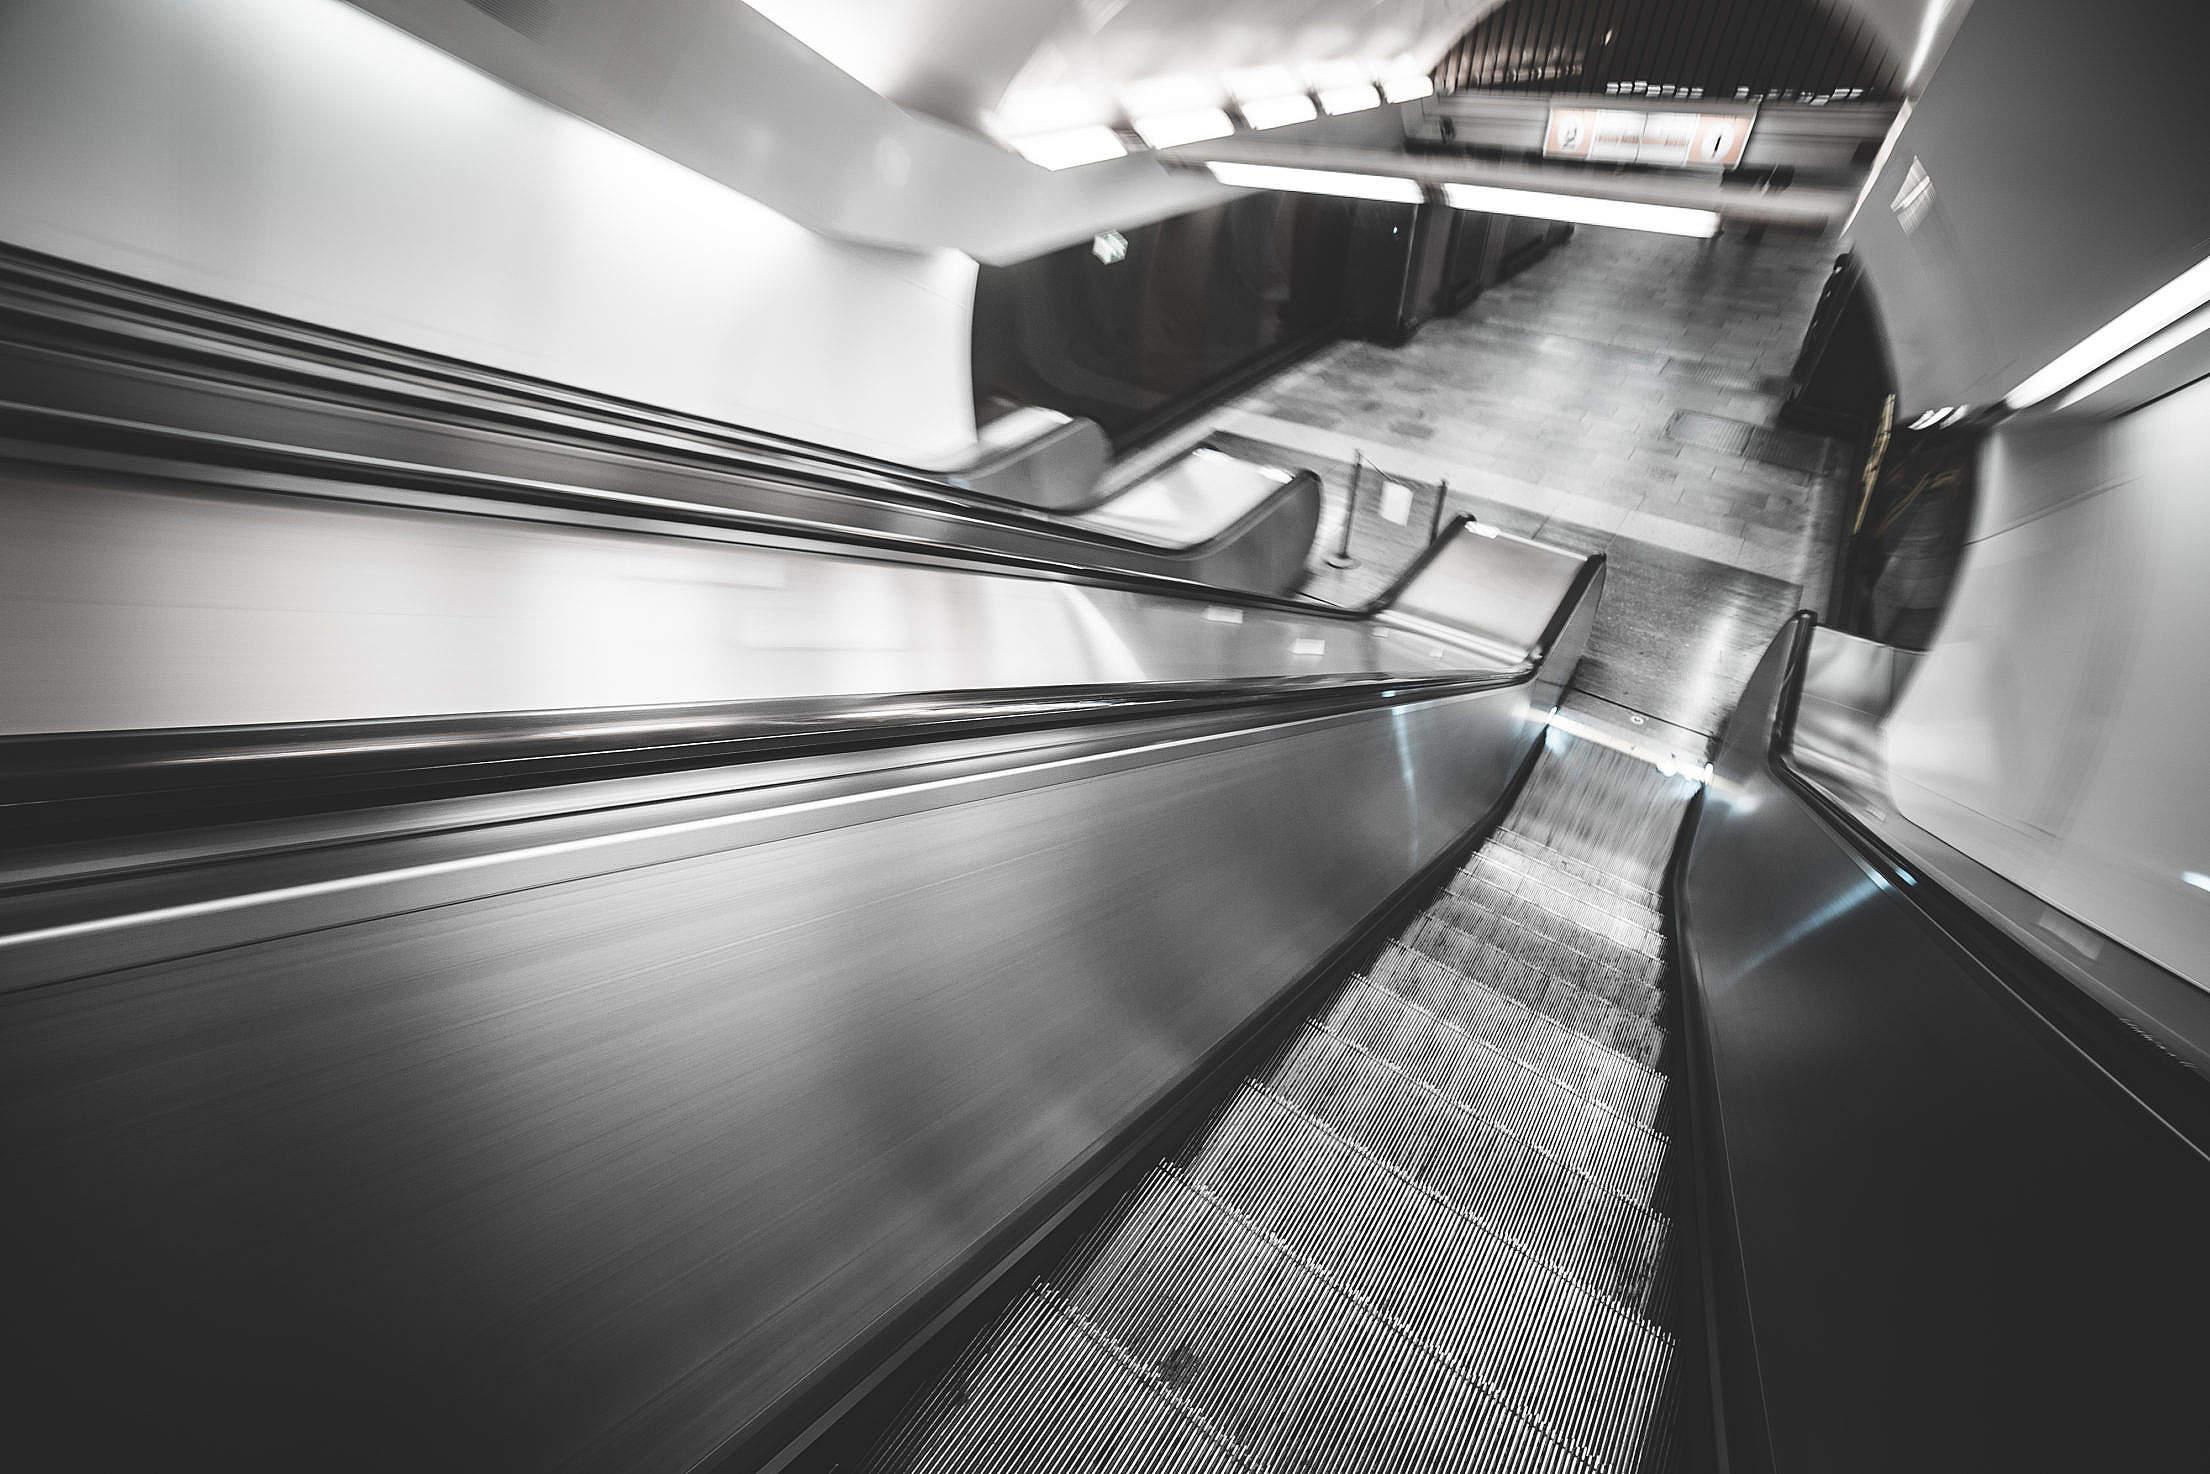 Underground Subway Escalator in Hypnotic Motion Free Stock Photo